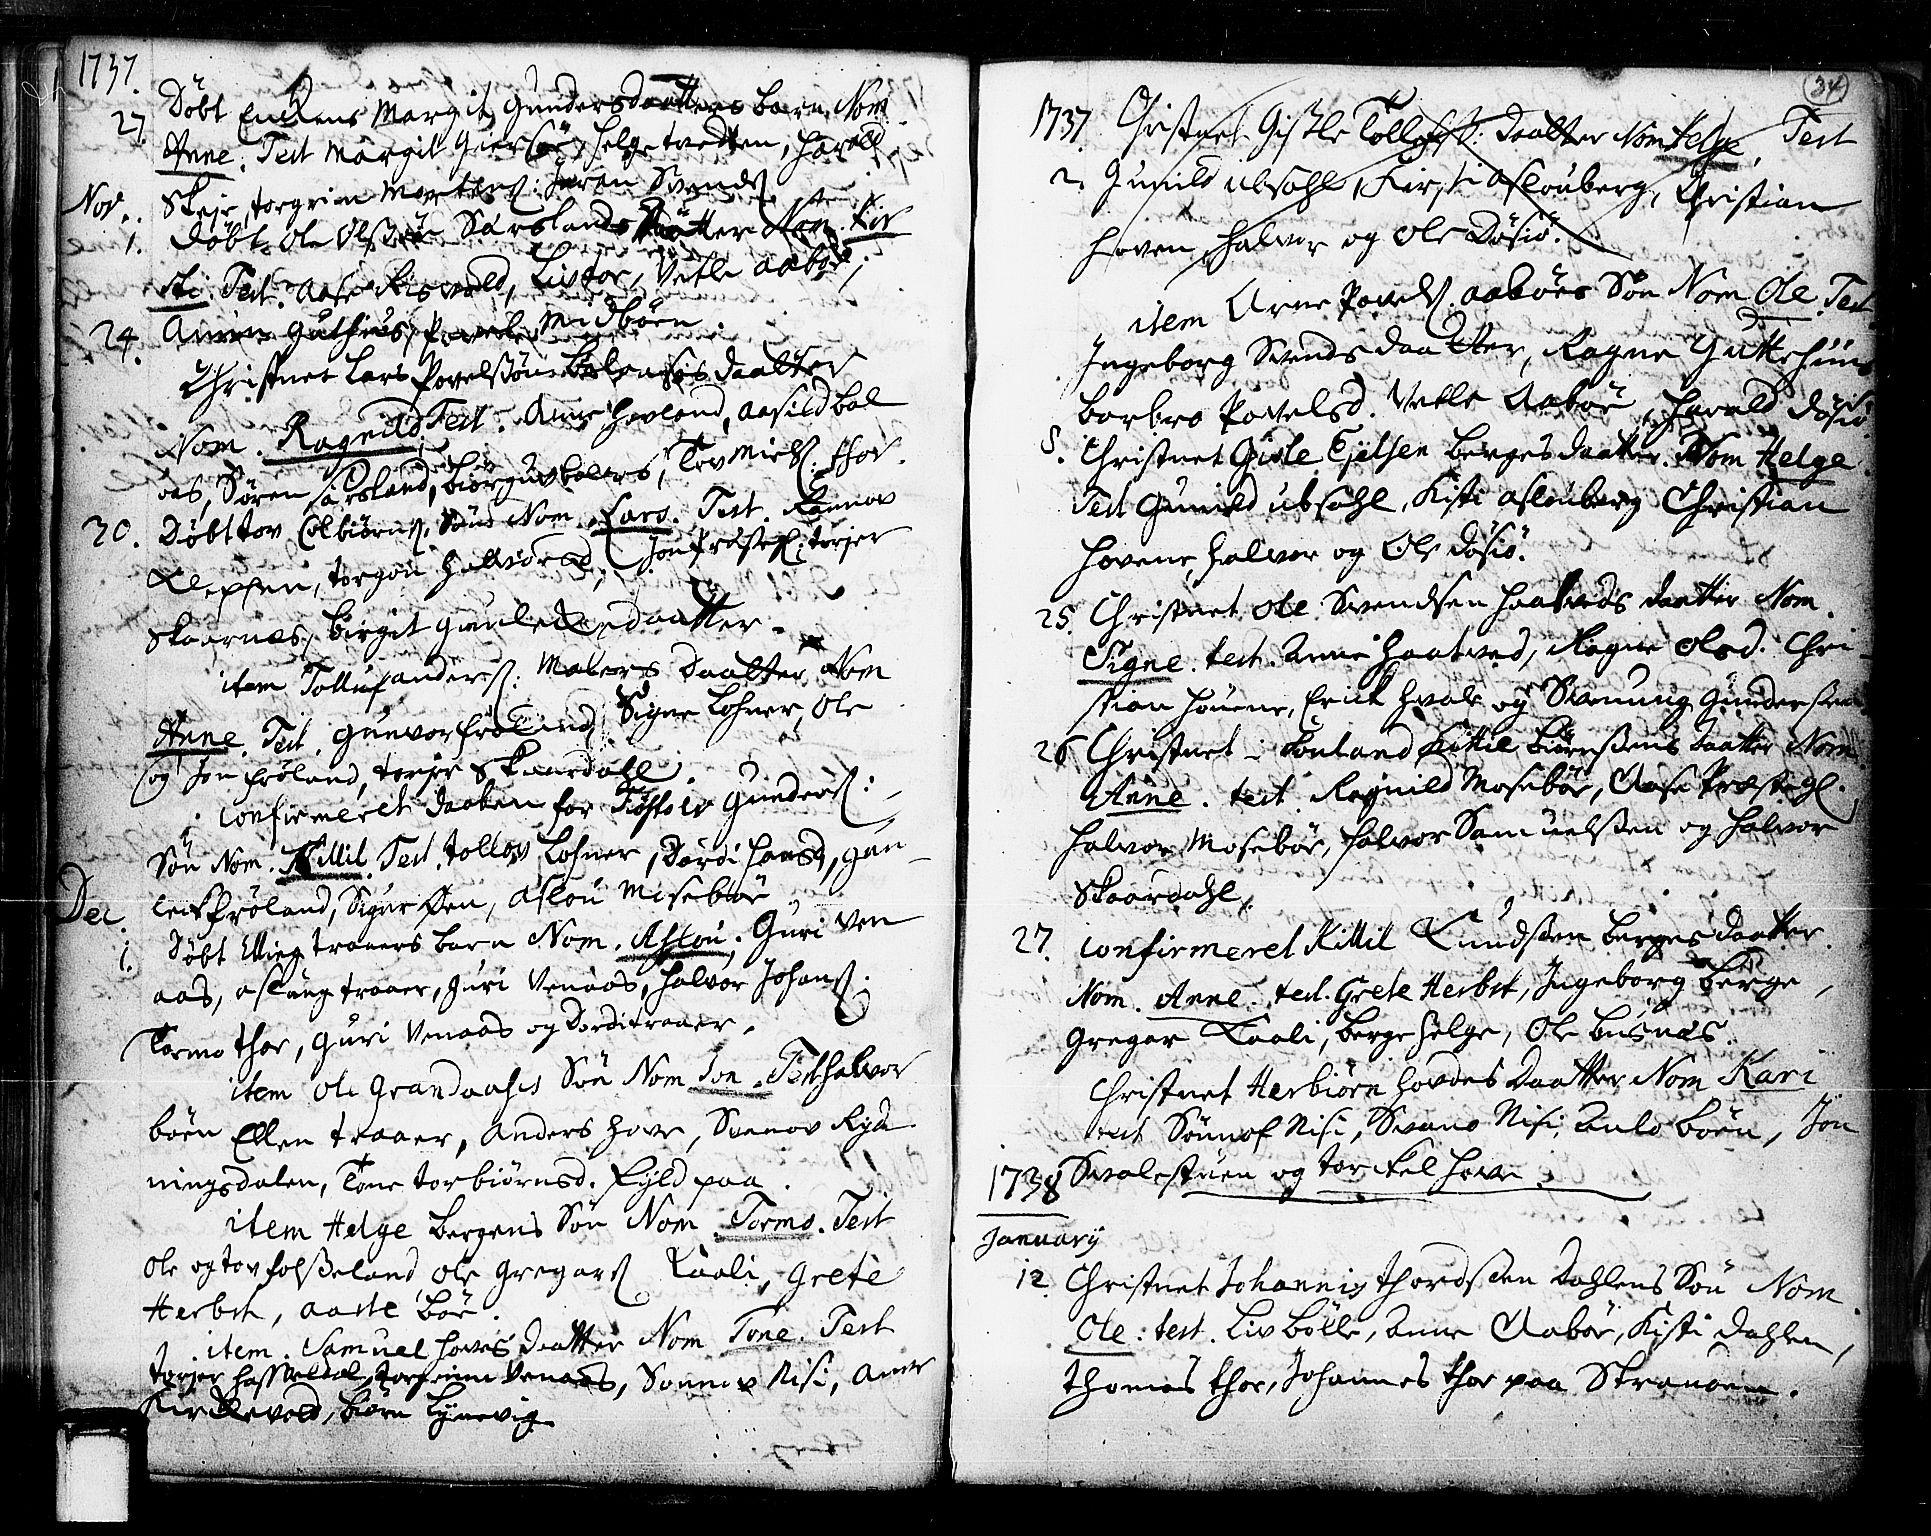 SAKO, Hjartdal kirkebøker, F/Fa/L0003: Ministerialbok nr. I 3, 1727-1775, s. 34